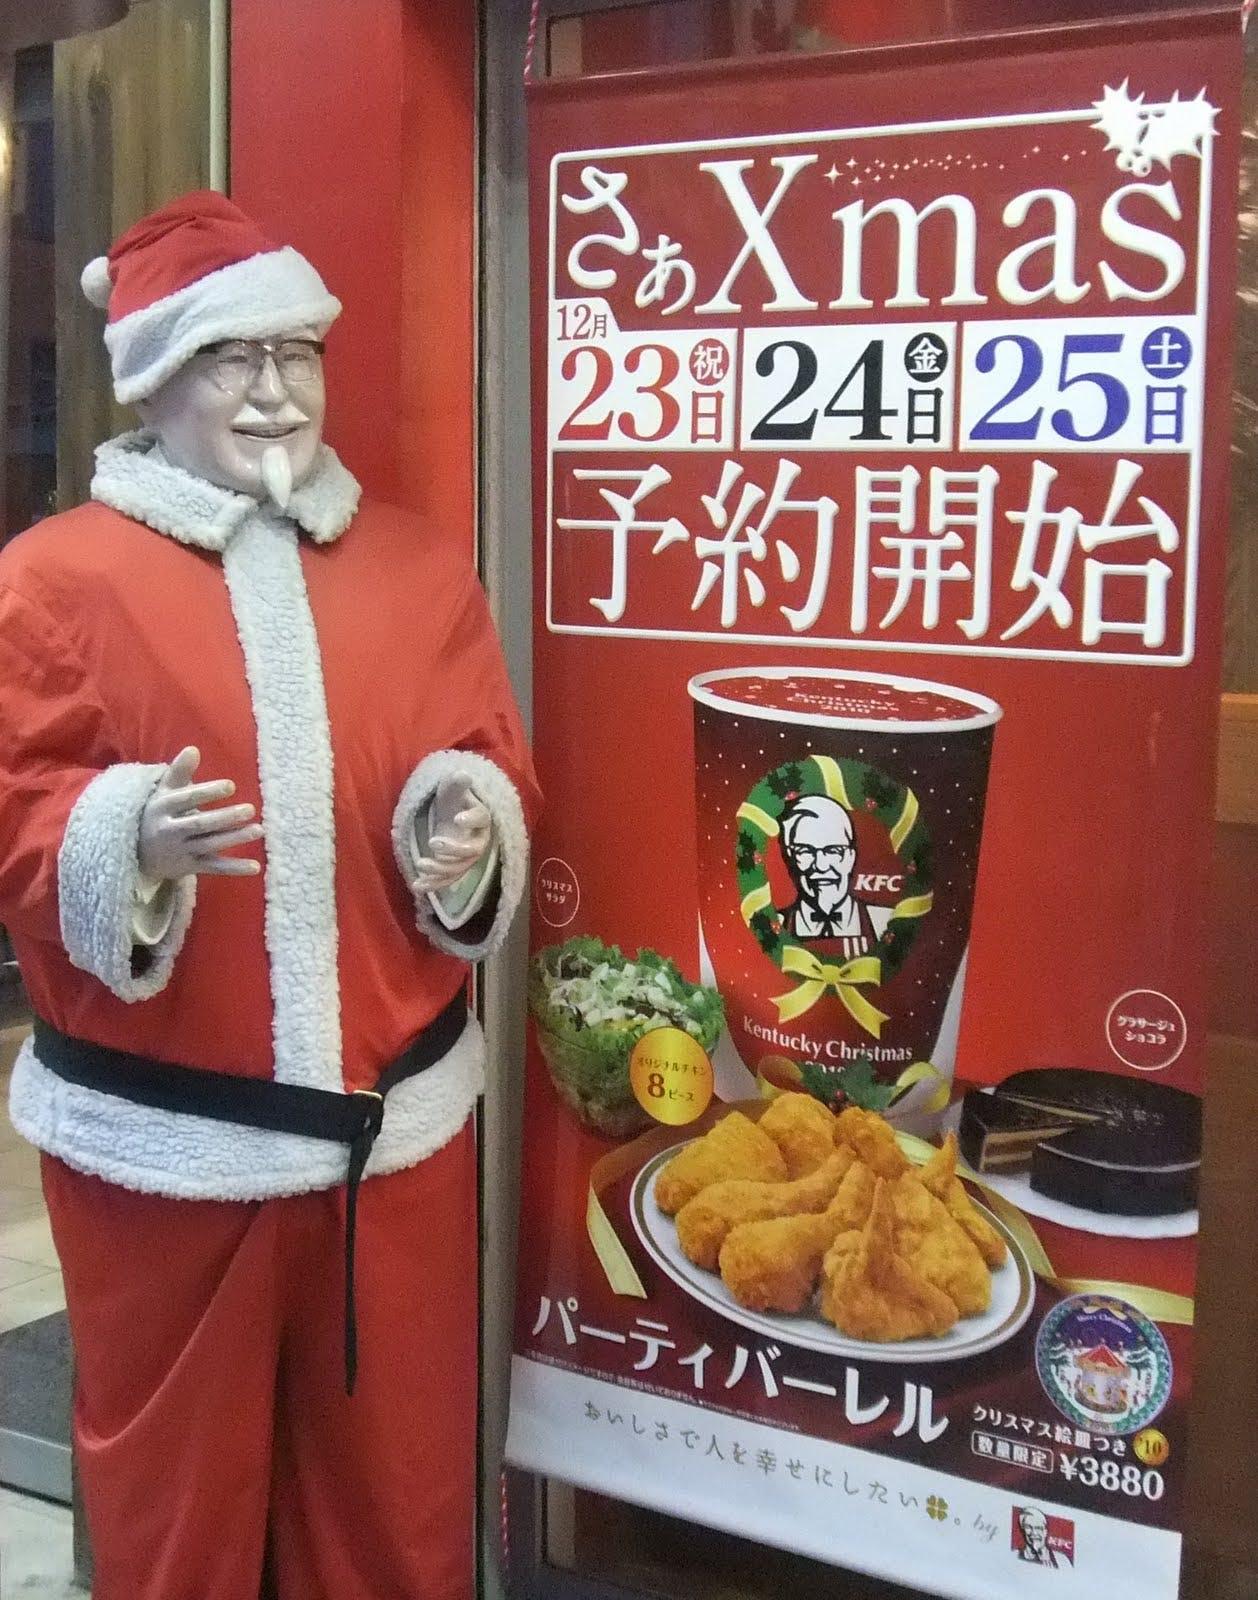 Japanese KFC at Christmas